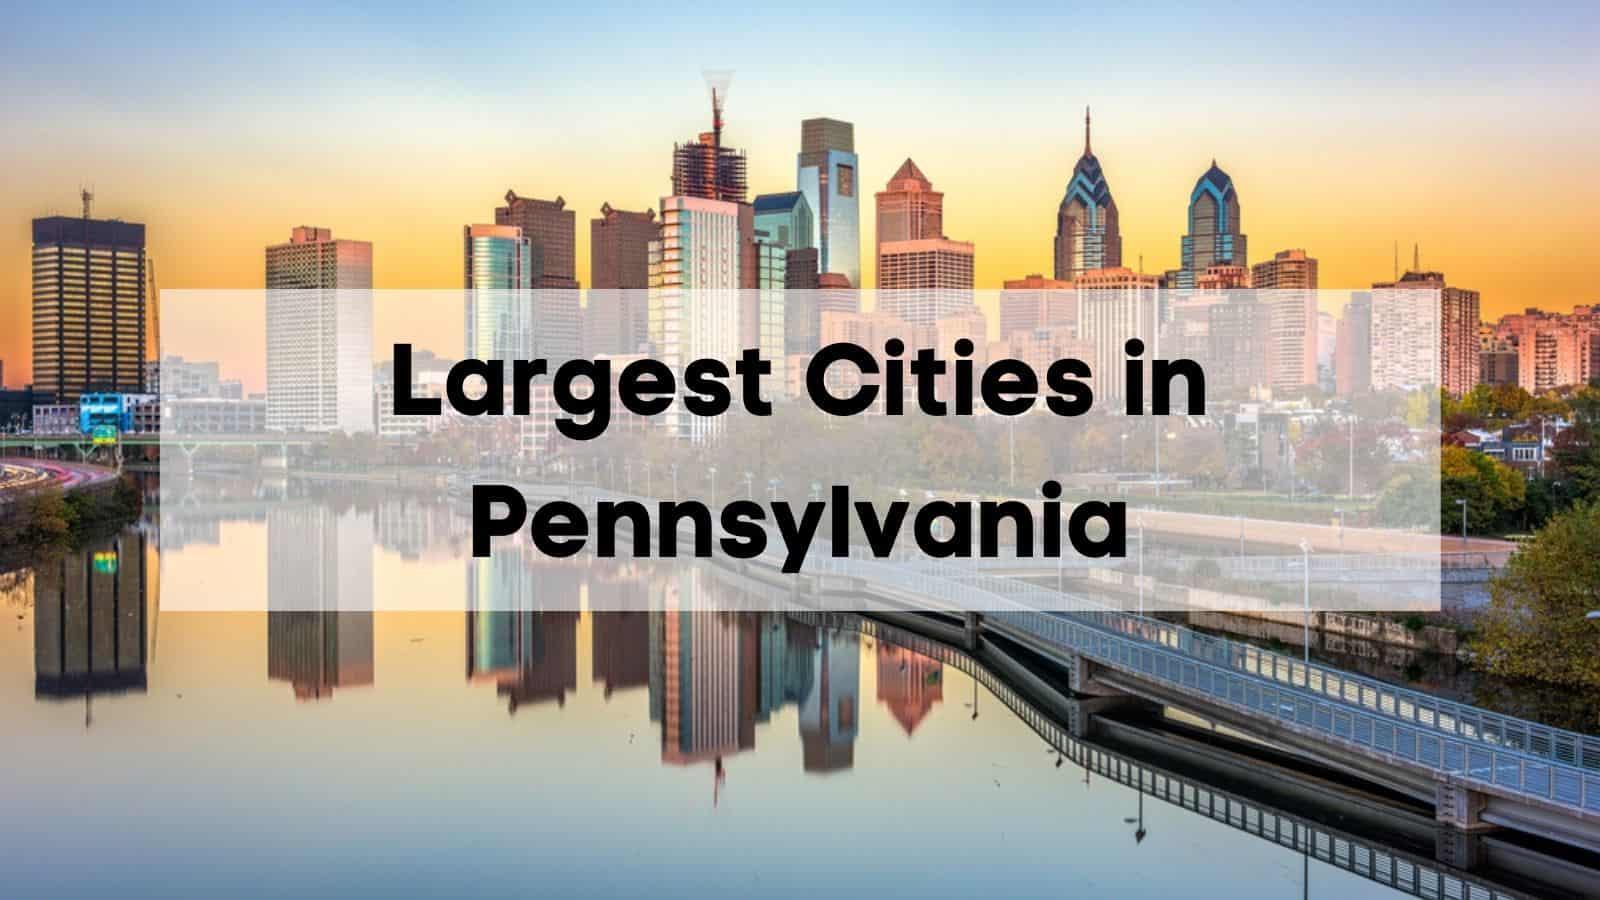 Largest Cities in Pennsylvania